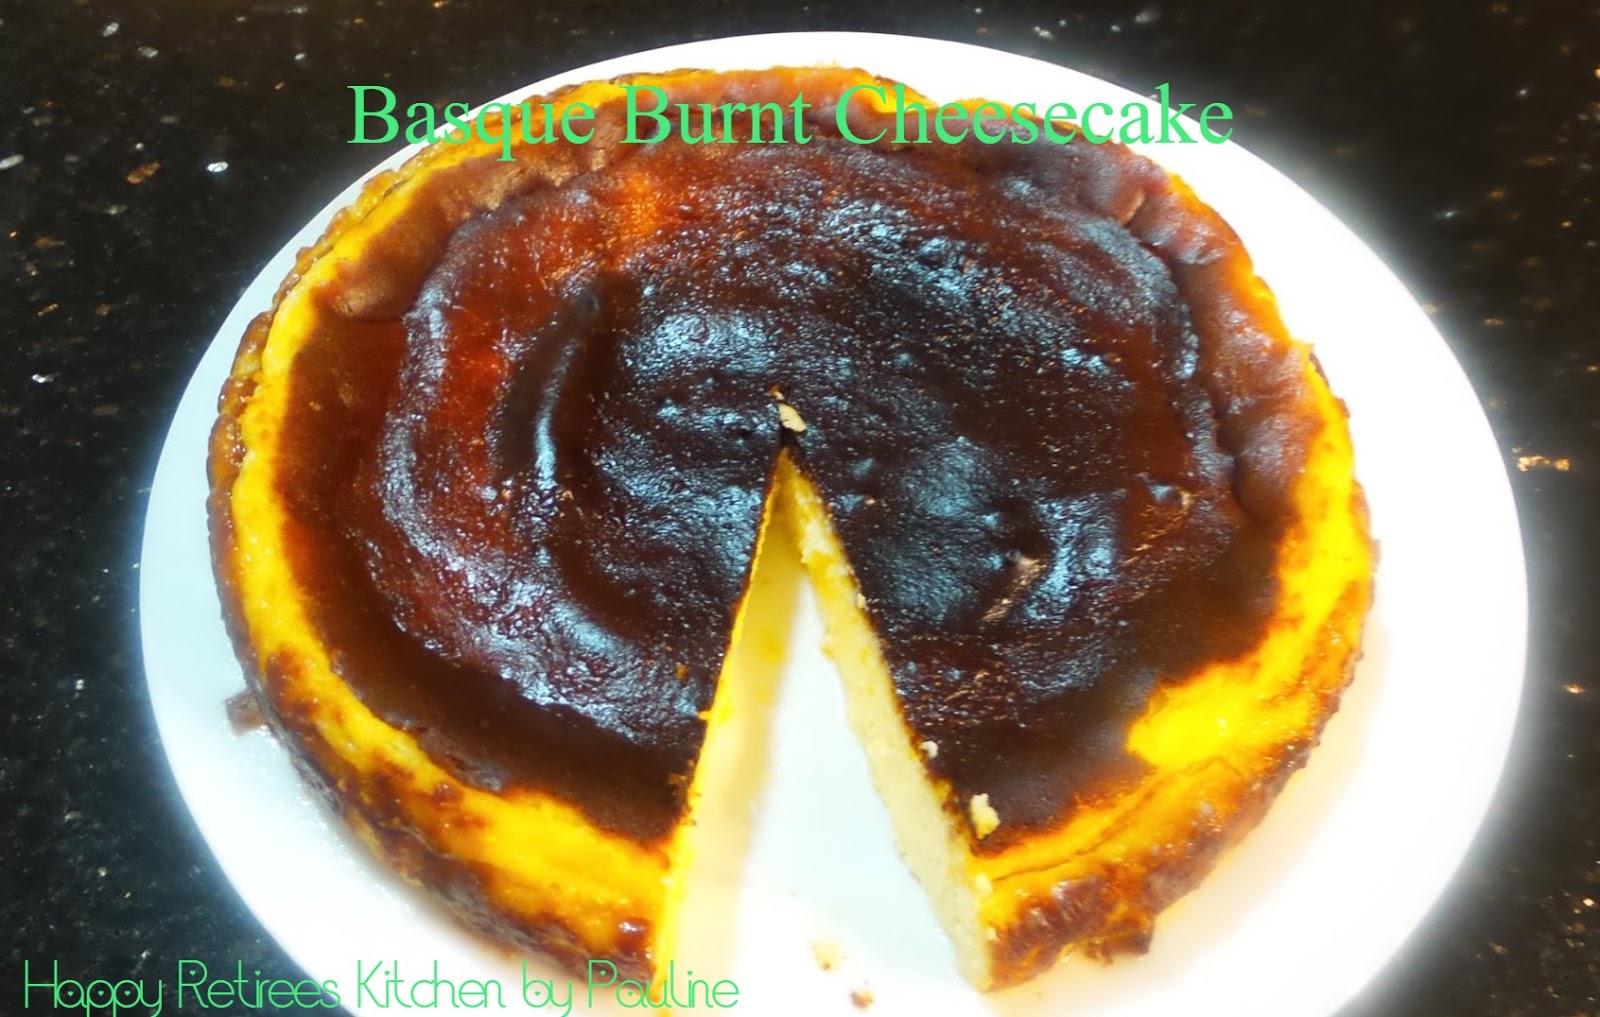 Happy Retirees Kitchen Basque Burnt Cheesecake